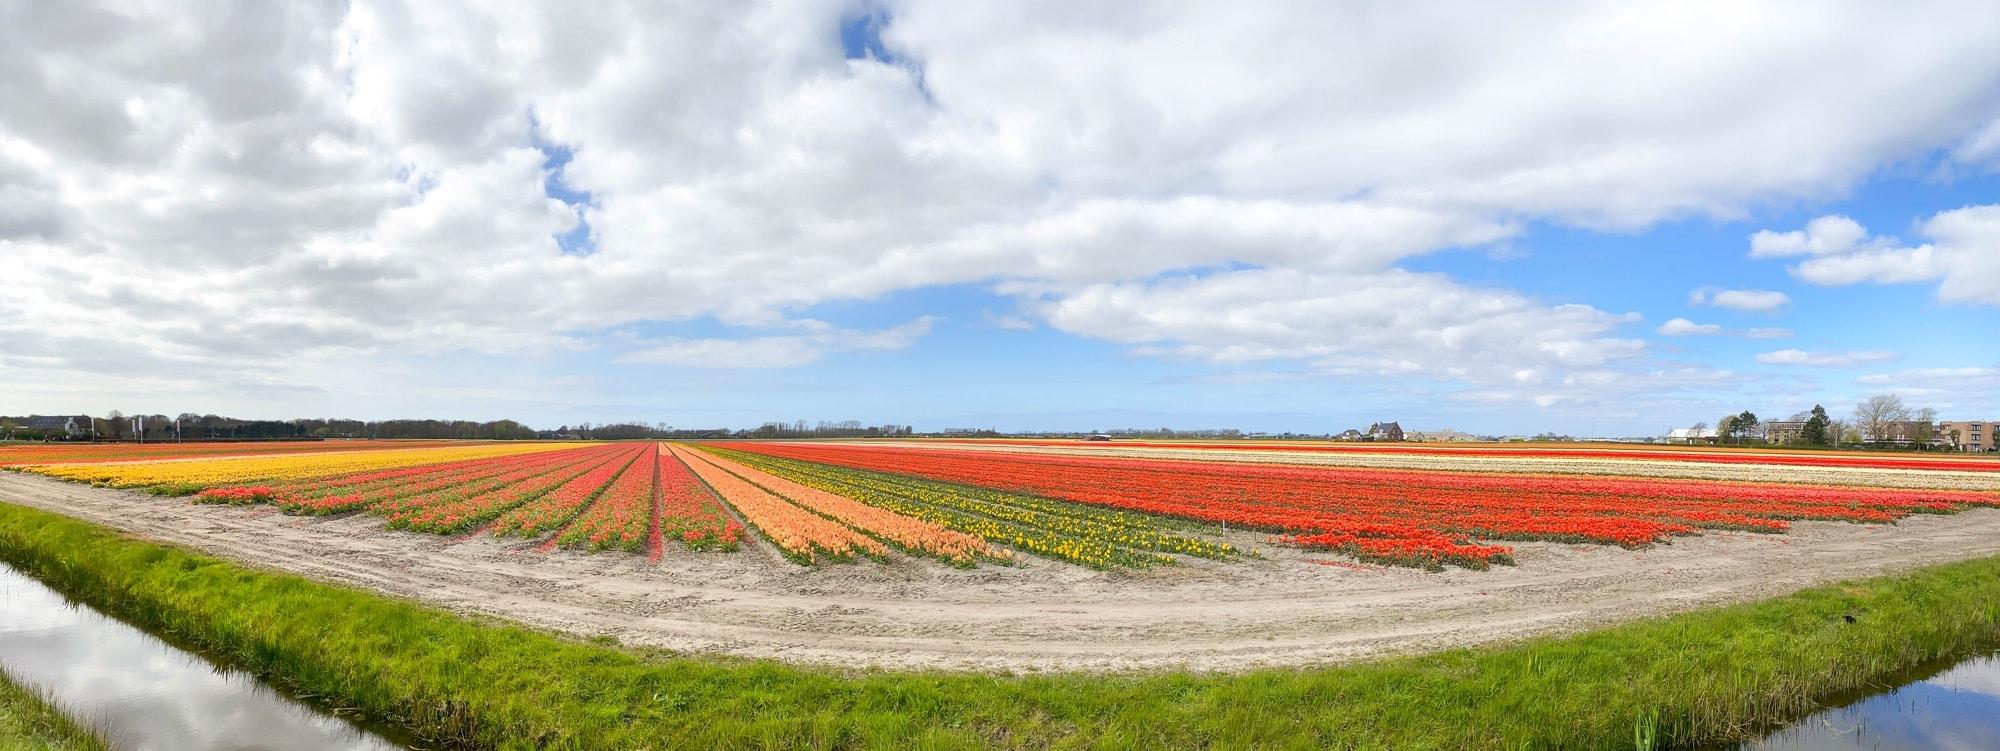 Tulpenfelder vor dem Keukenhof, Amsterdam